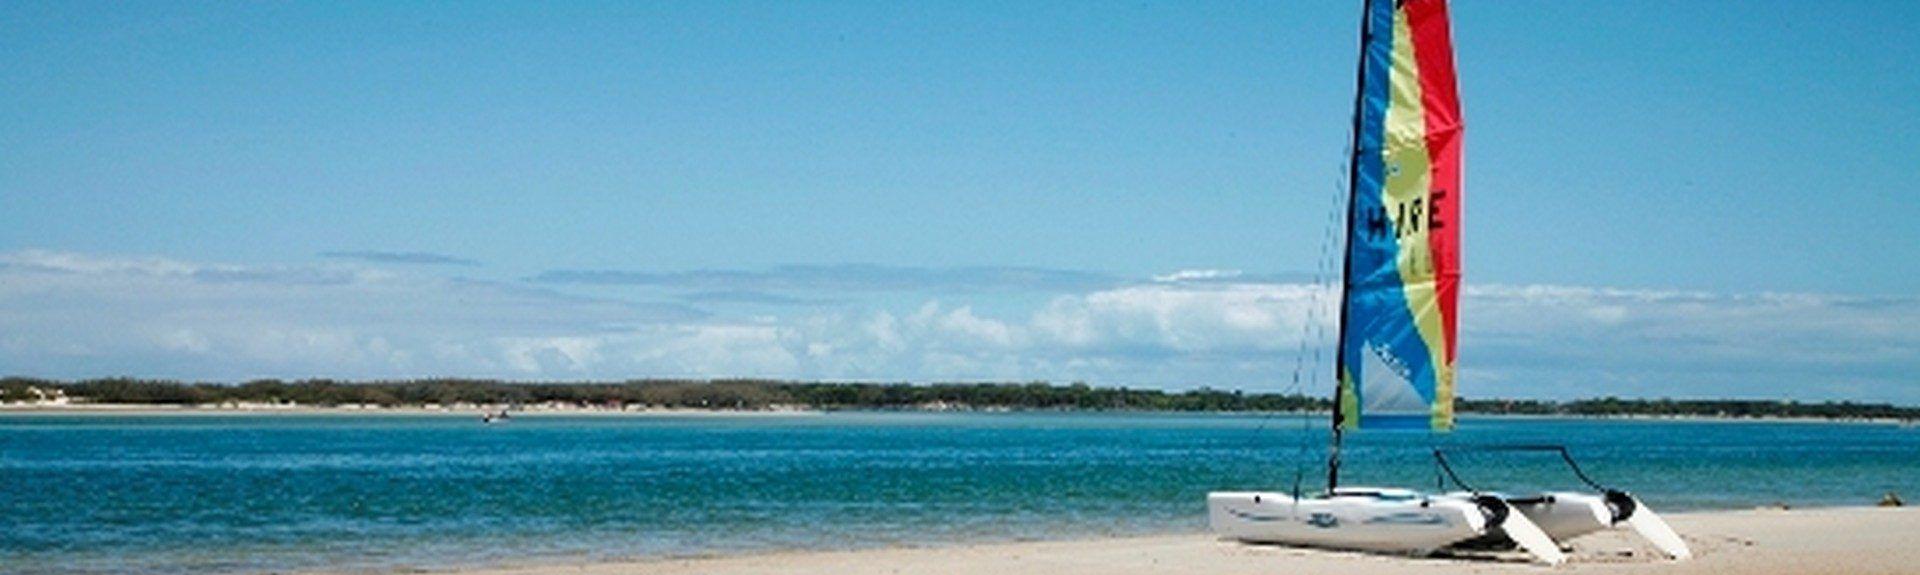 Welsby QLD, Australia